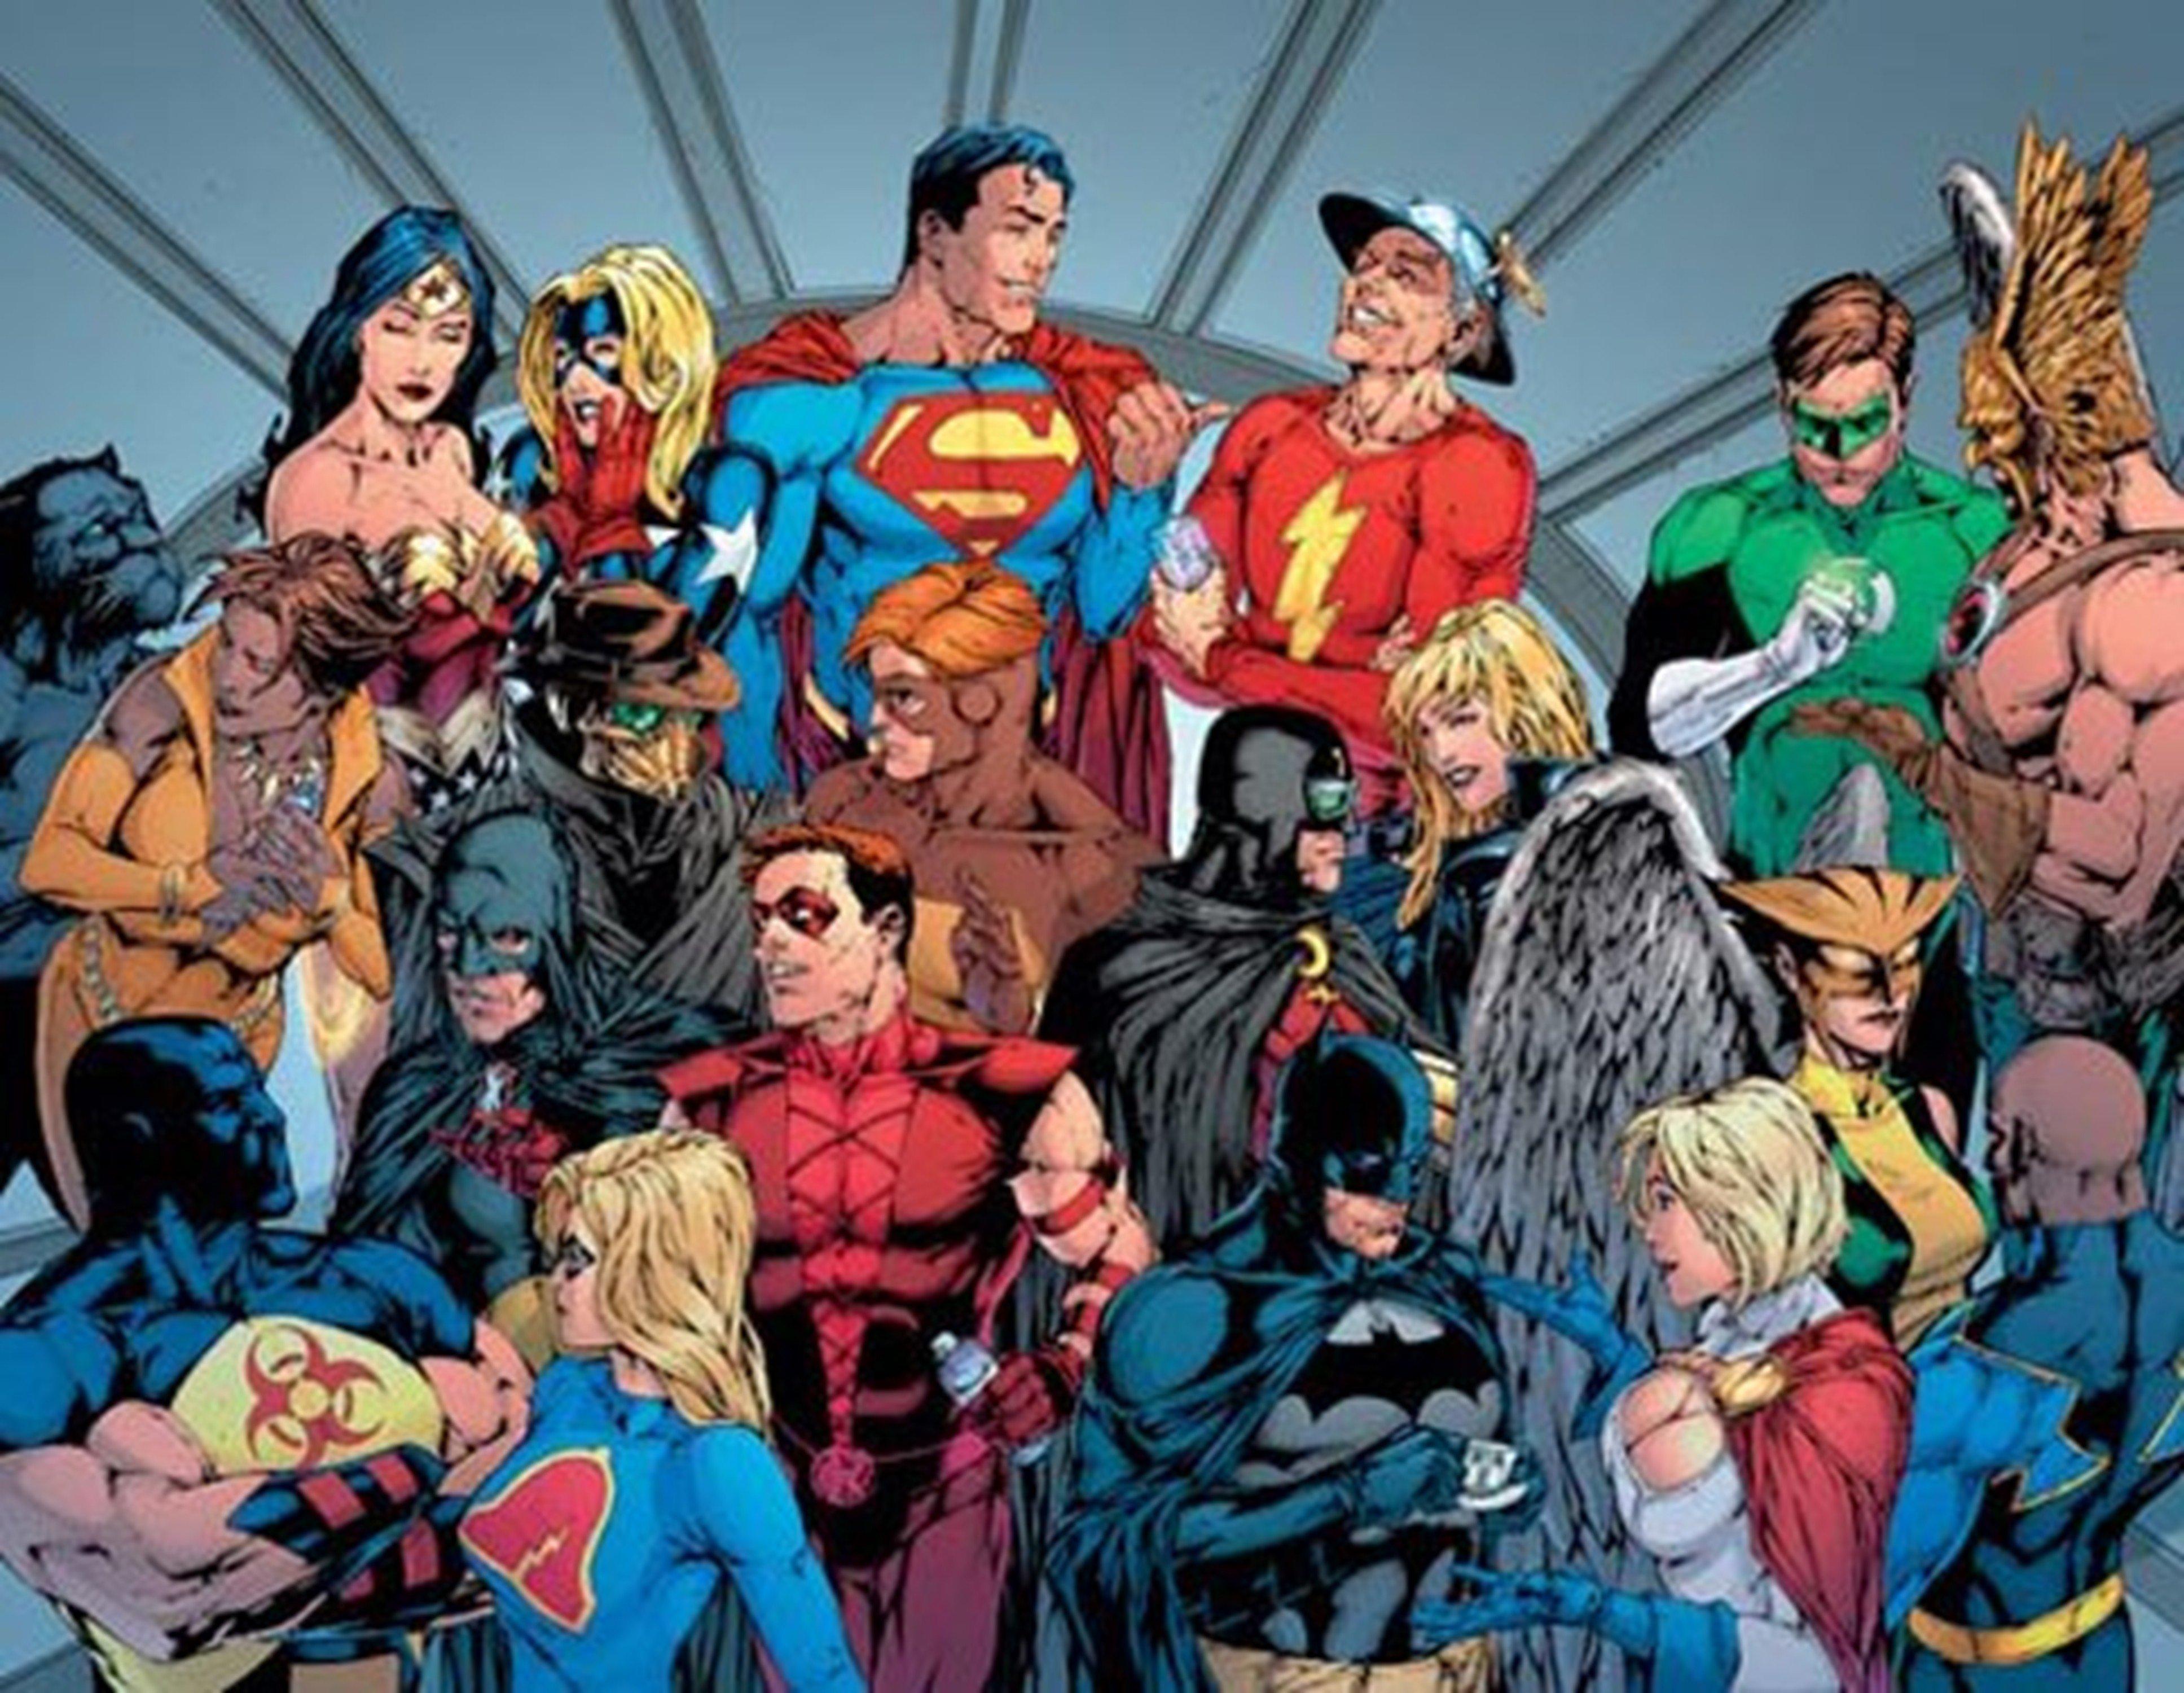 Dc Comics Justice League : Dc justice league wallpaper wallpapersafari